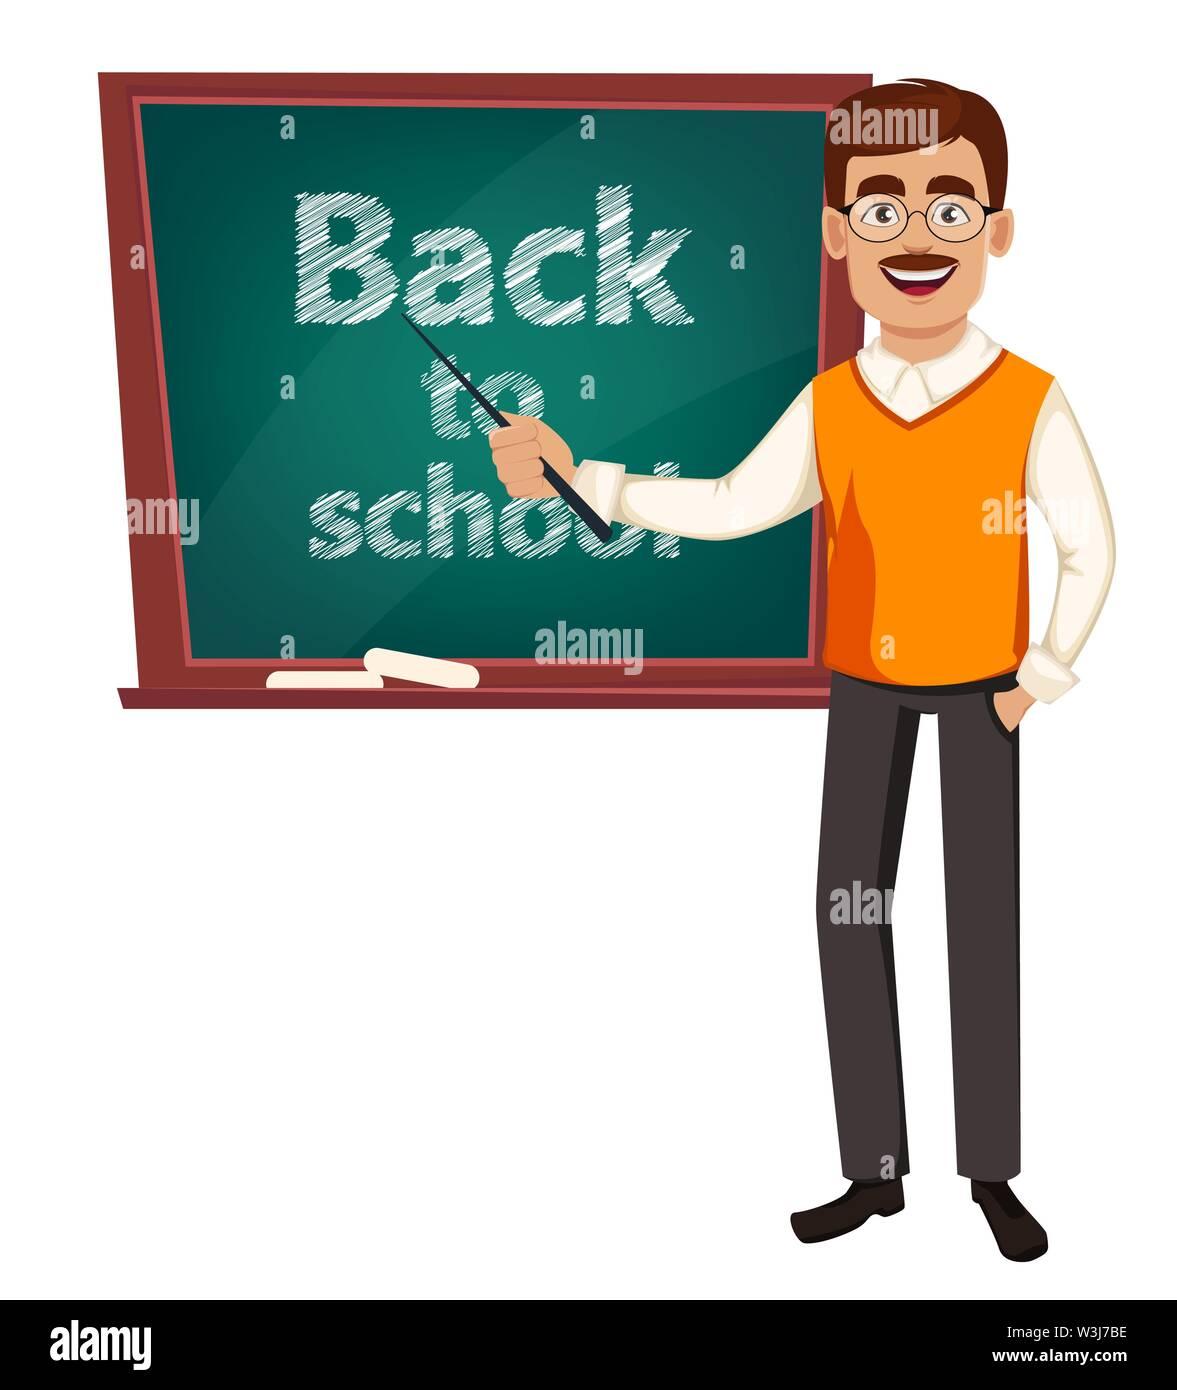 Back to school. Teacher man cartoon character stands near chalkboard. Teacher's day. Vector illustration - Stock Image